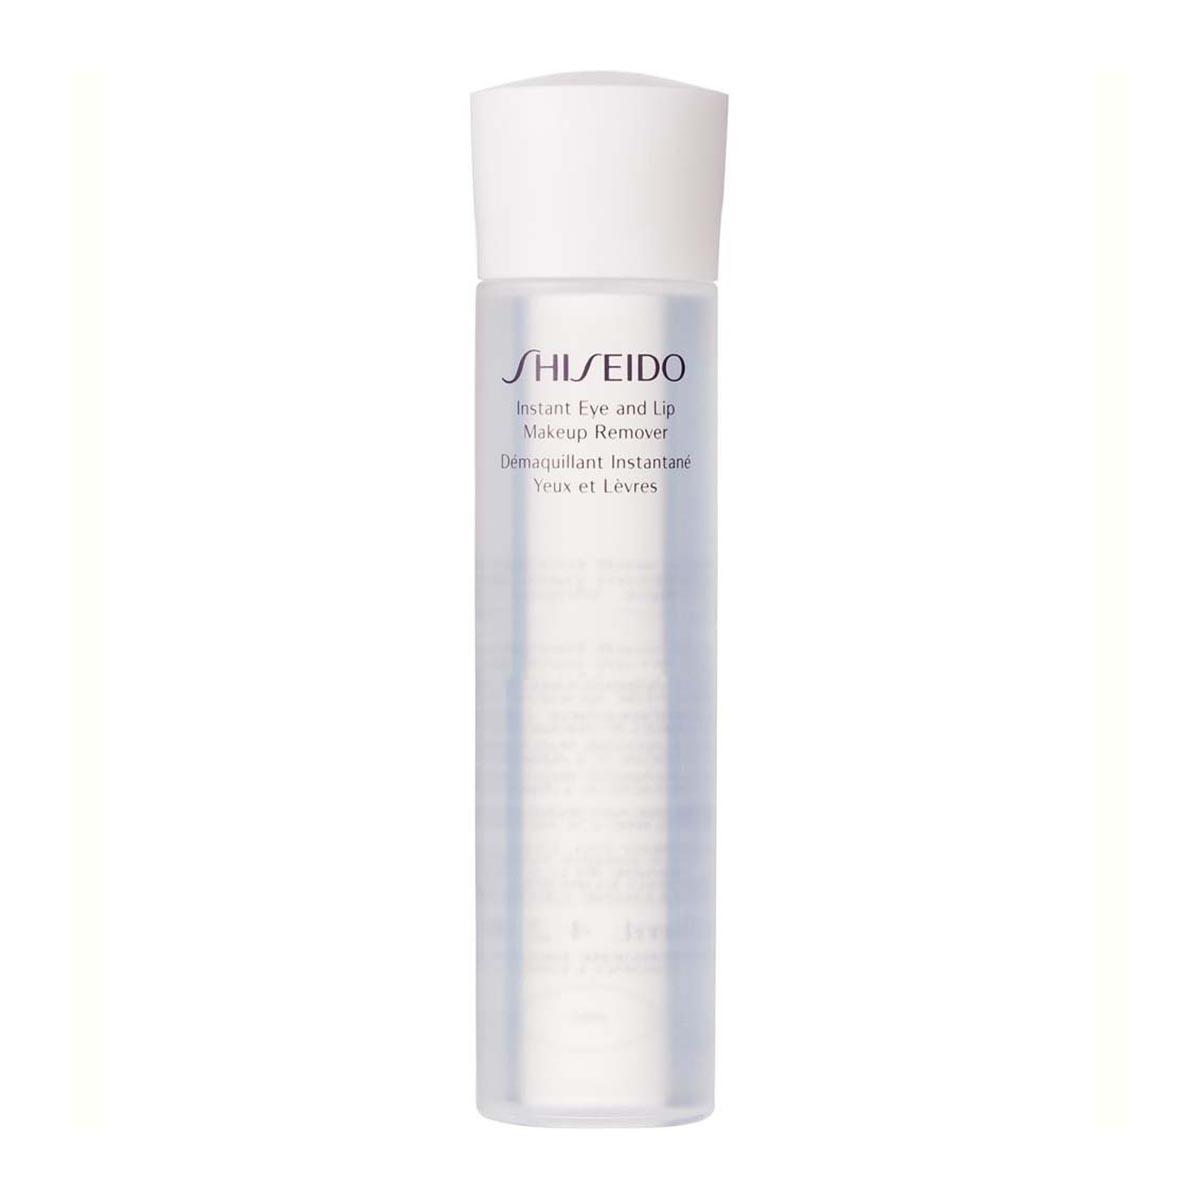 Shiseido instant eye lip makeup remover 125ml